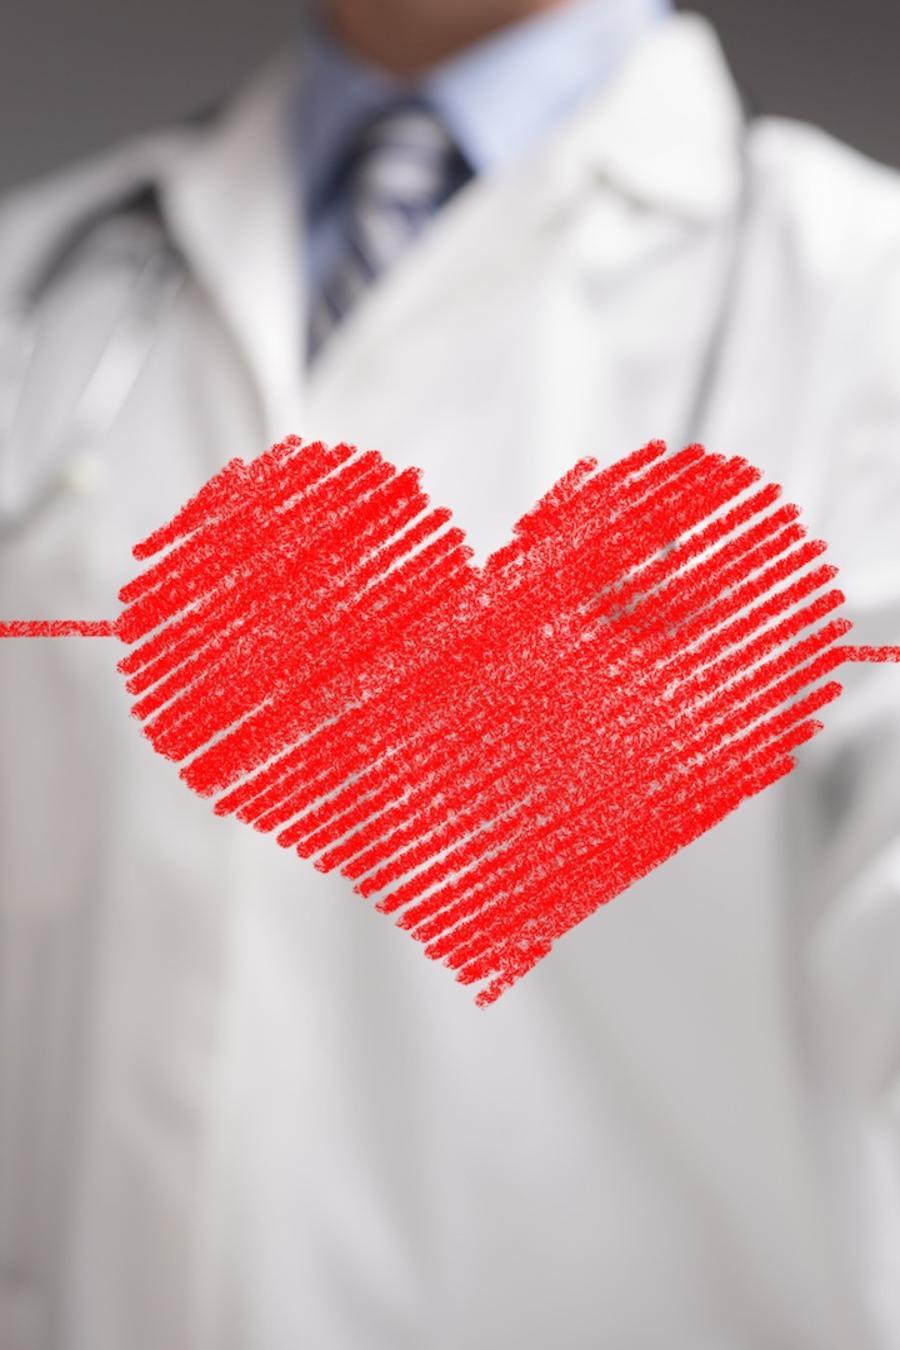 Médico dibujando un corazón